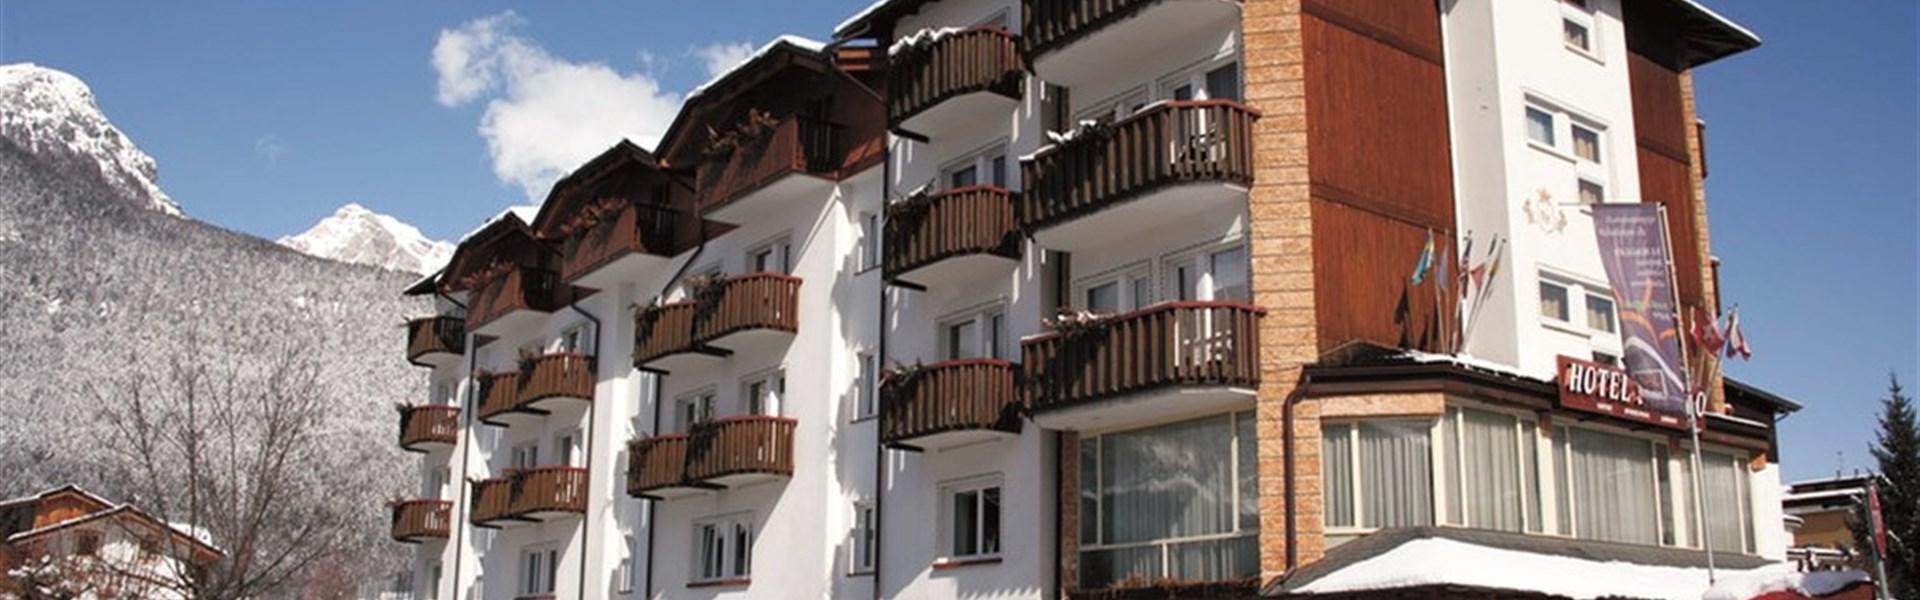 Hotel Andalo -